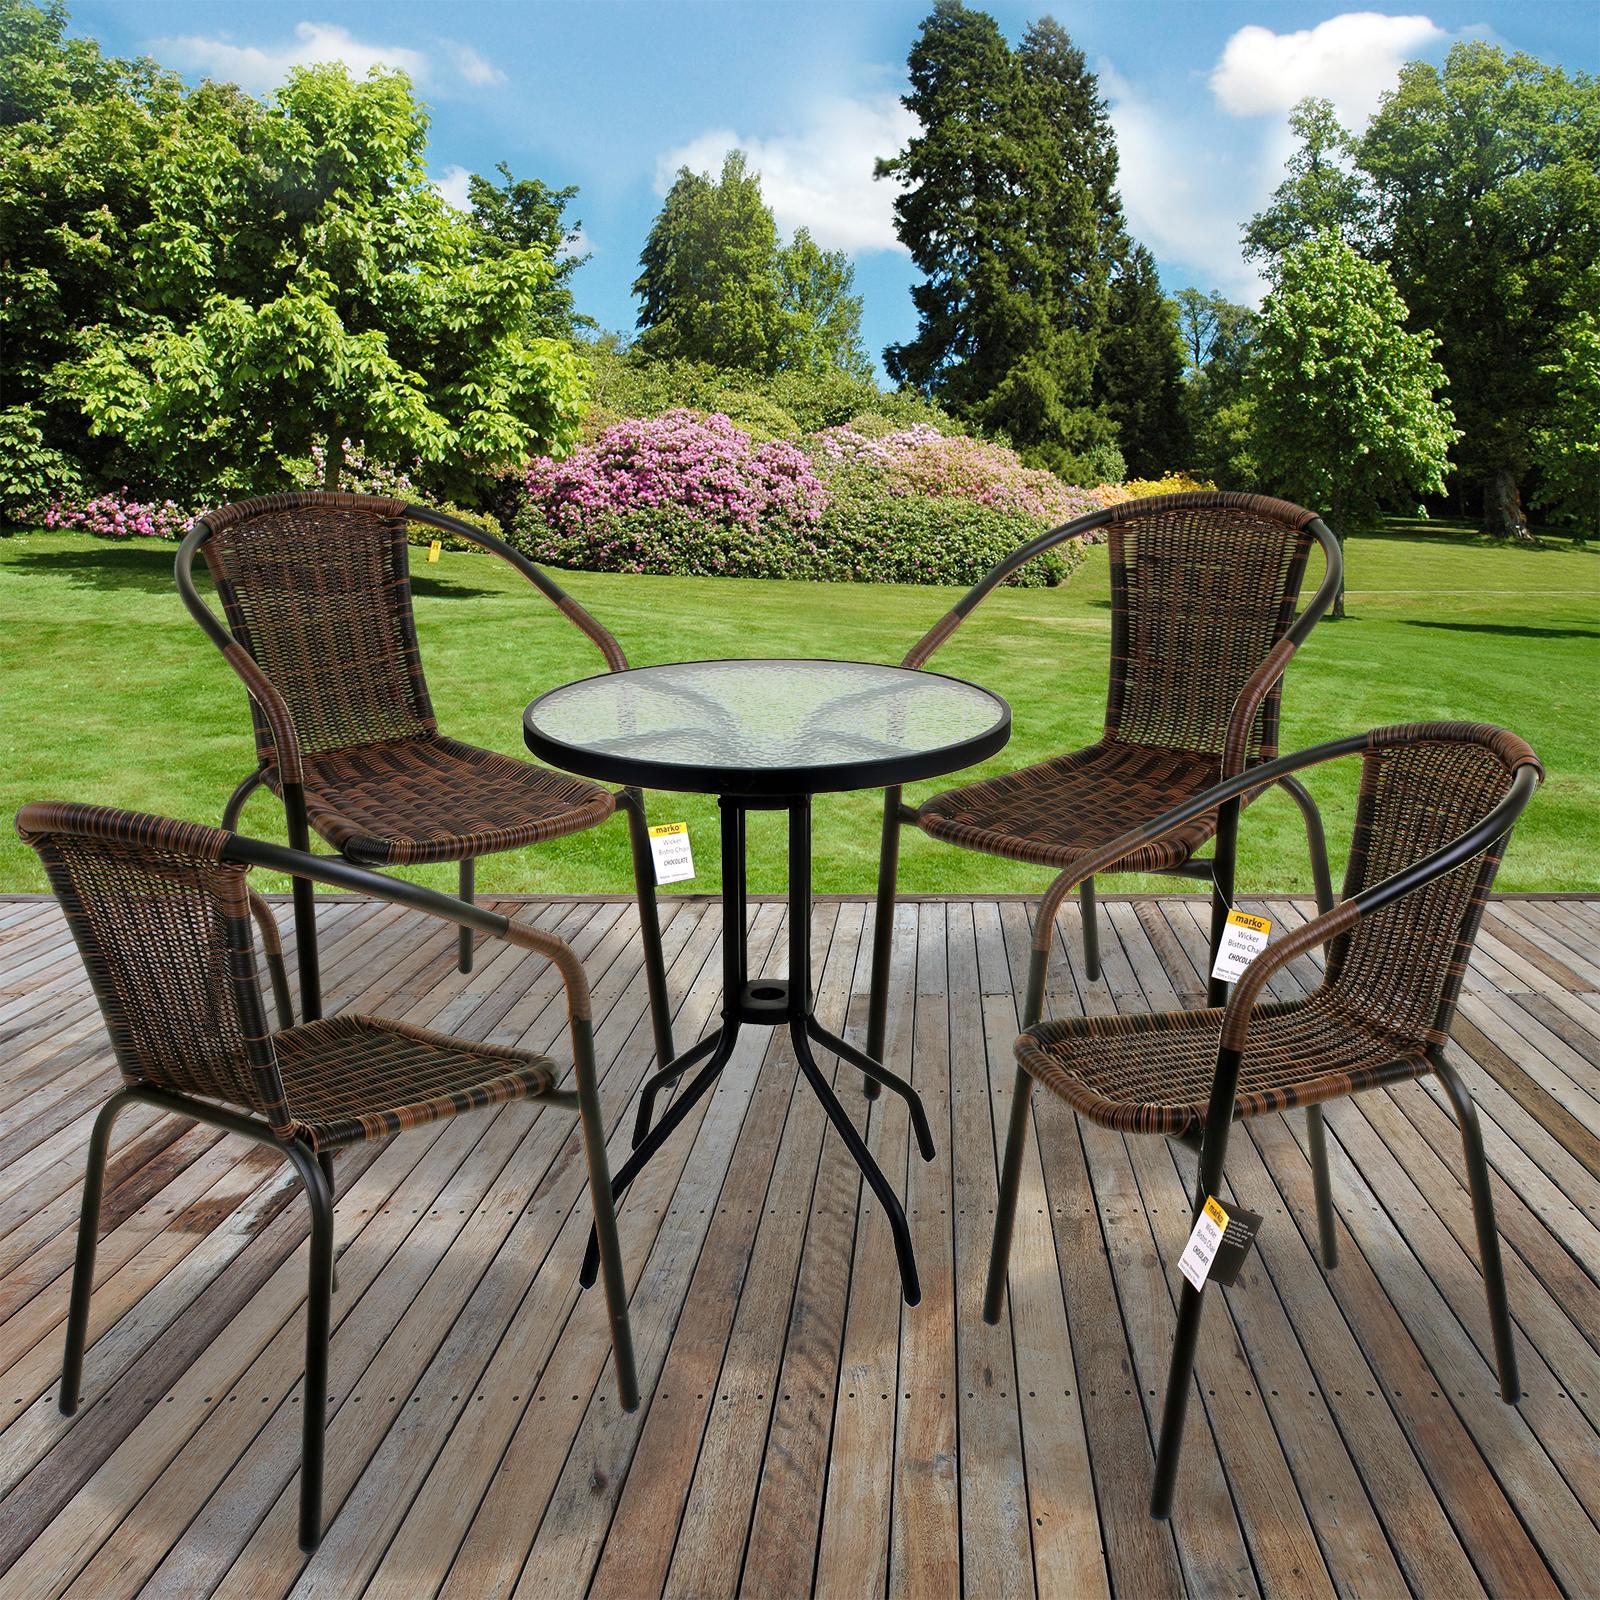 Details About 5 Piece Garden Patio Chocolate Wicker Bistro Set Outdoor Furniture Seating